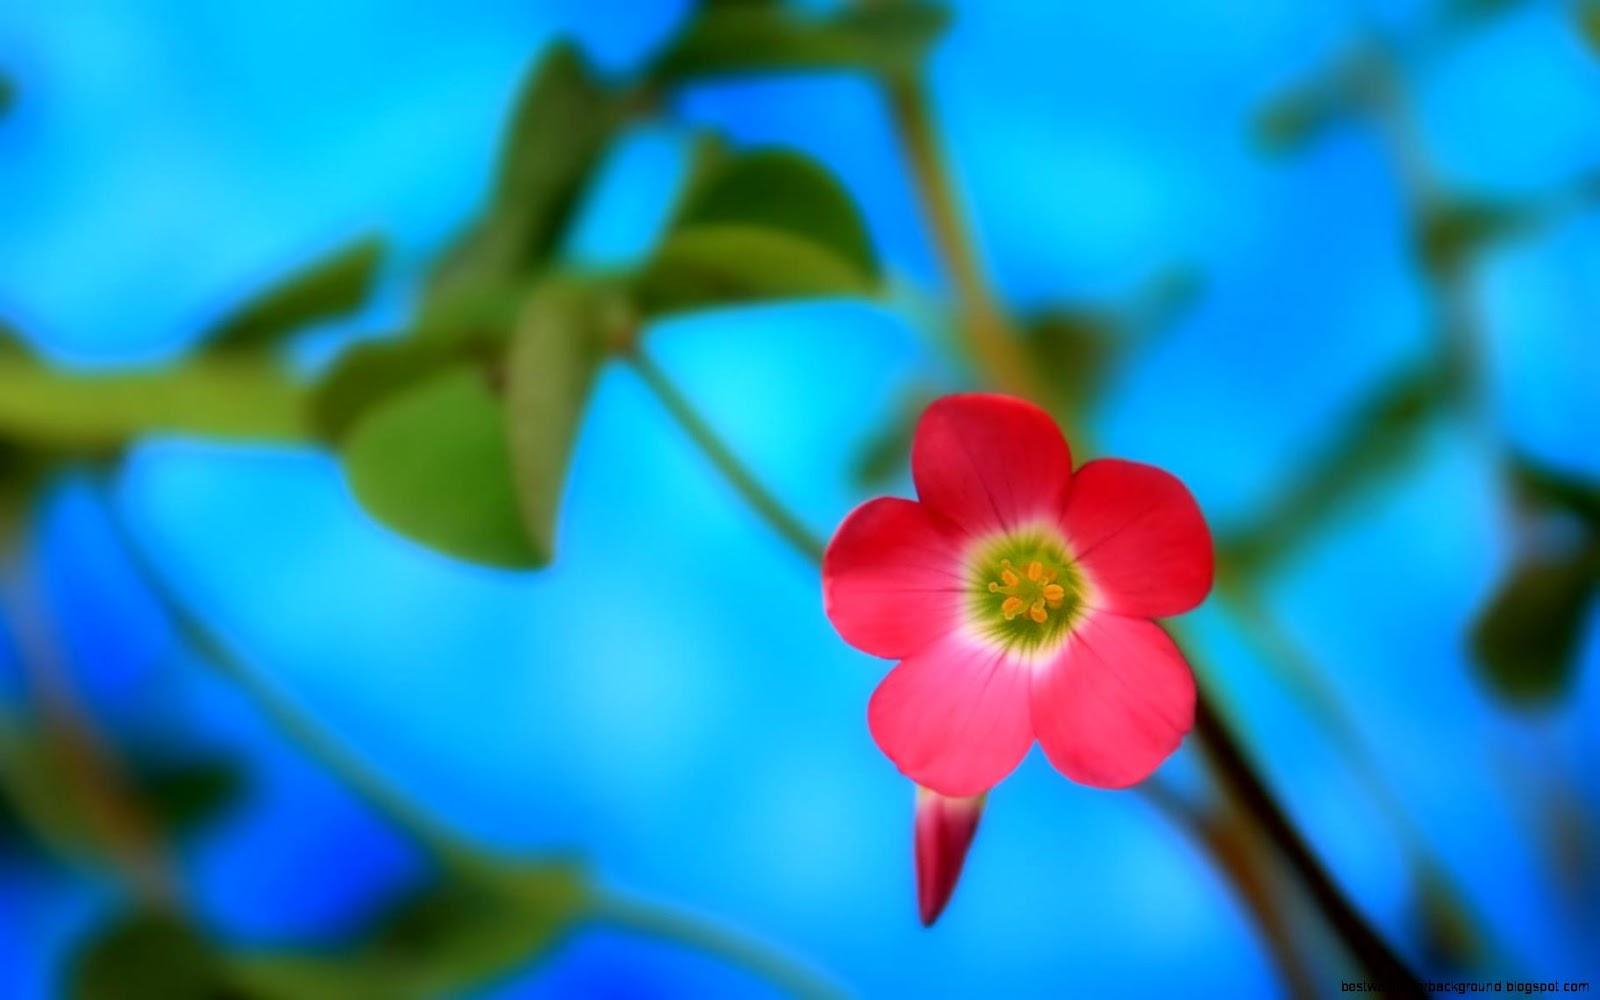 Spring flowers screensavers wallpaper best wallpaper background view original size flower free spring screensavers mightylinksfo